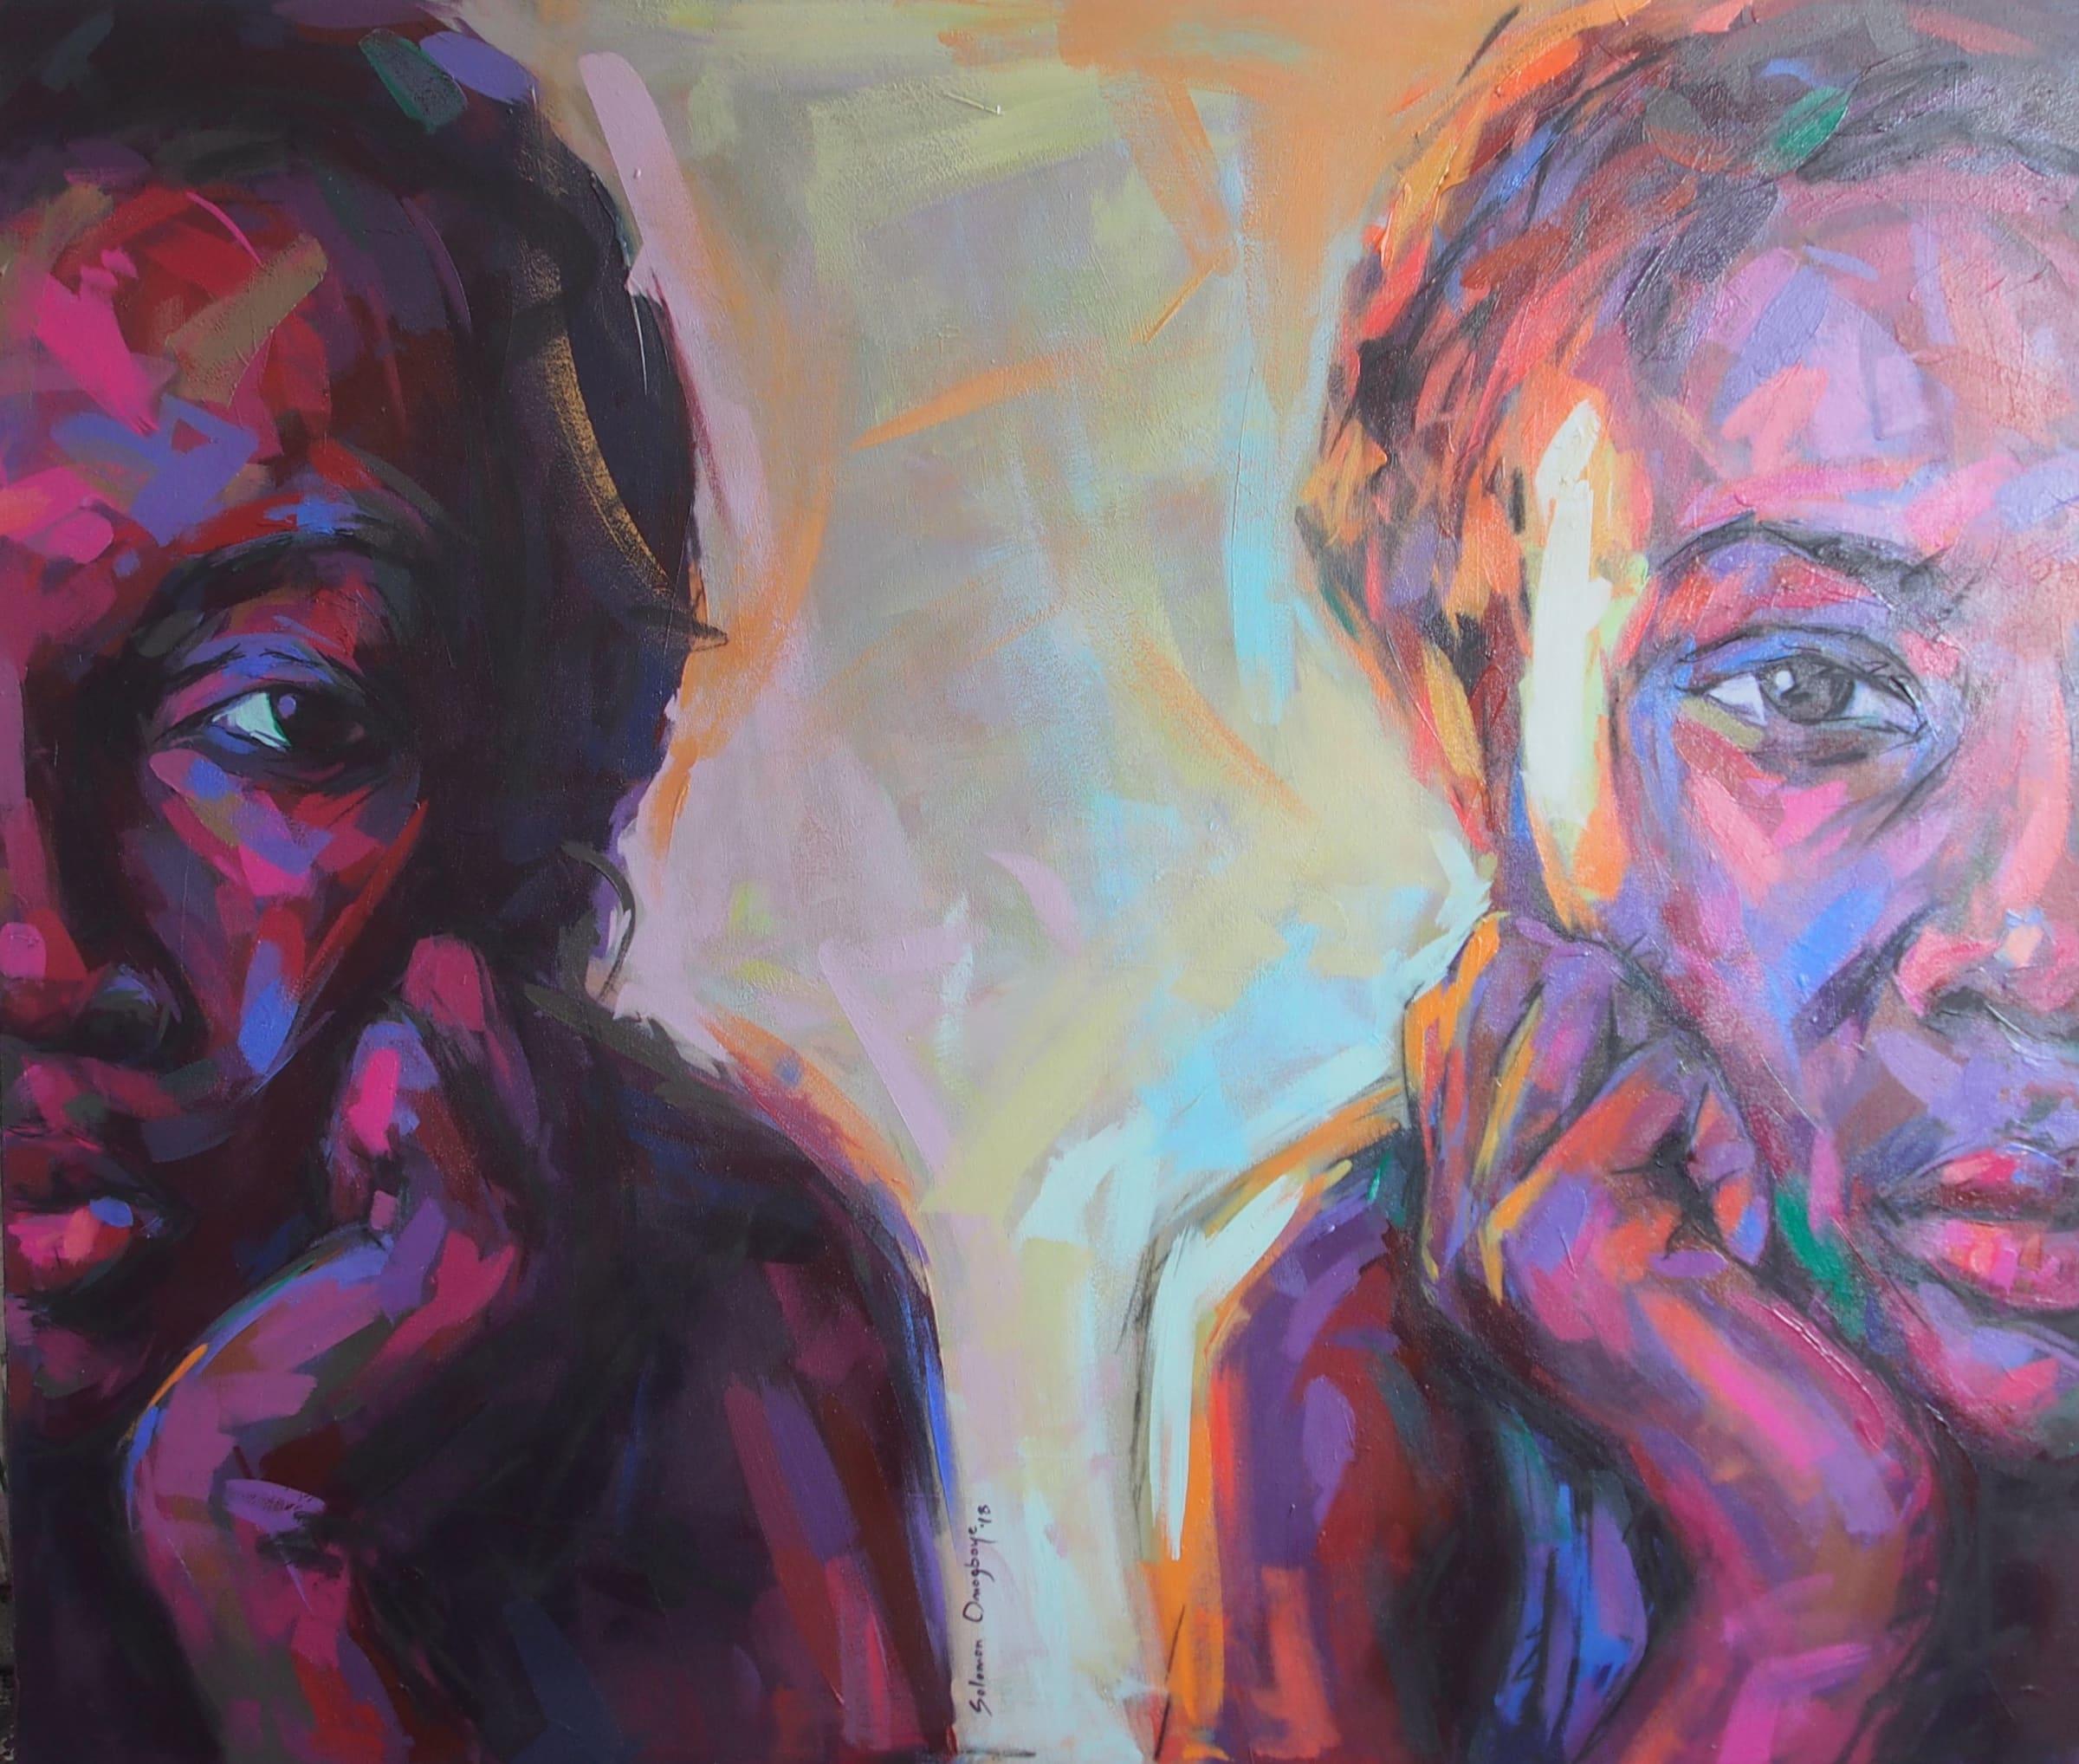 <span class=&#34;link fancybox-details-link&#34;><a href=&#34;/artists/39-solomon-omogboye/works/2014-solomon-omogboye-wena-wena-2018/&#34;>View Detail Page</a></span><div class=&#34;artist&#34;><strong>Solomon Omogboye</strong></div> <div class=&#34;title&#34;><em>Wena Wena</em>, 2018</div> <div class=&#34;medium&#34;>Acrylic On Canvas</div> <div class=&#34;dimensions&#34;>130cm x 110cm</div><div class=&#34;price&#34;>R28,600.00</div>